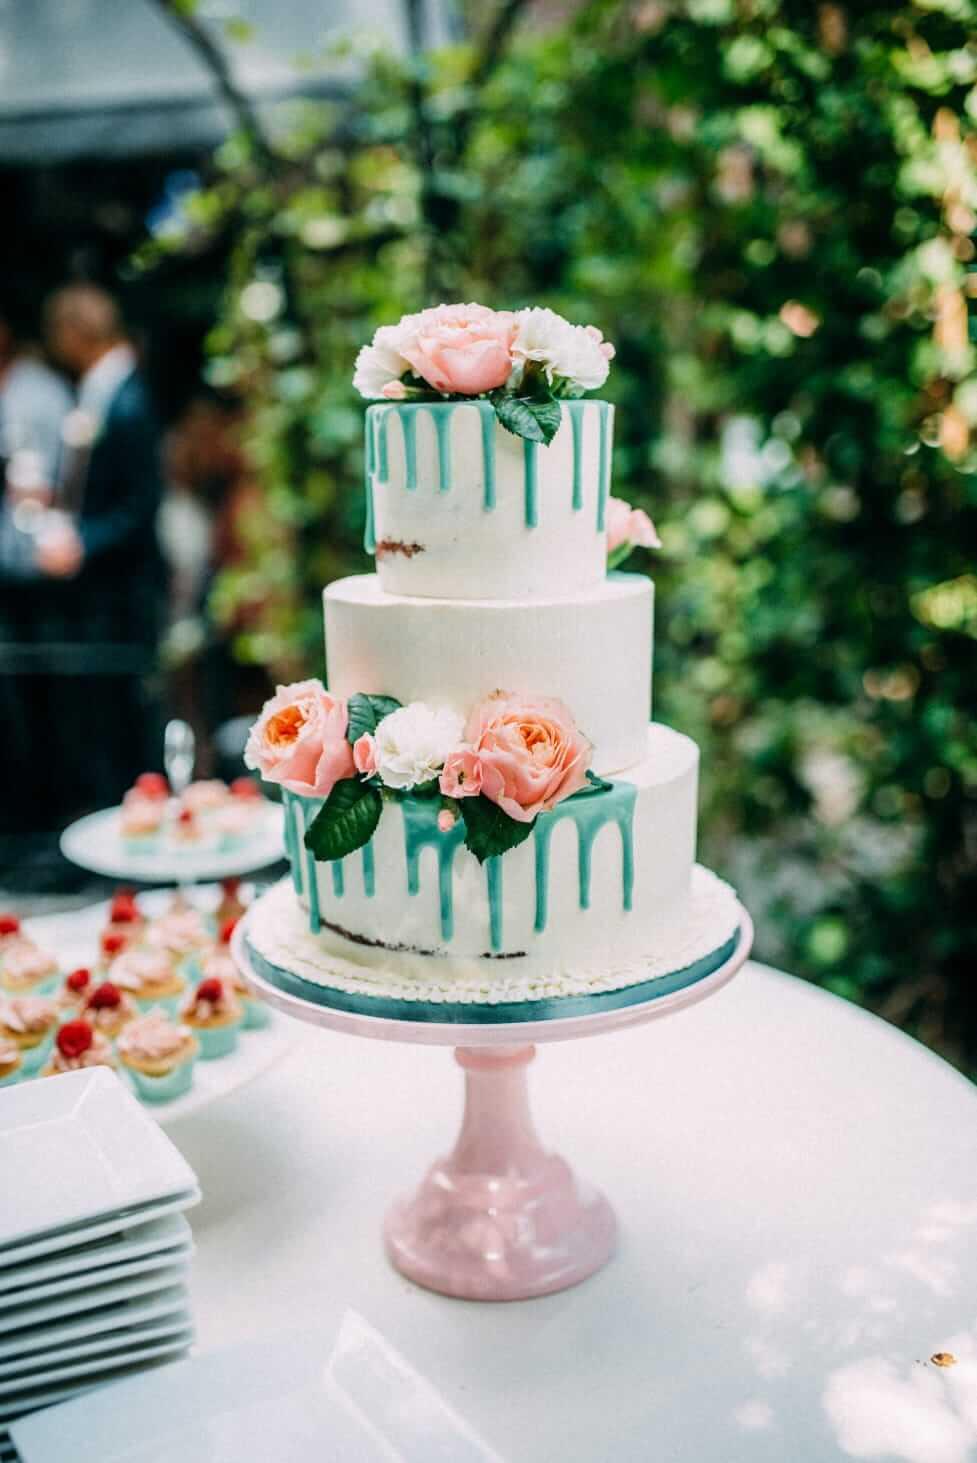 Mint Drip Semi Naked Cake Bruiloft bruidstaart